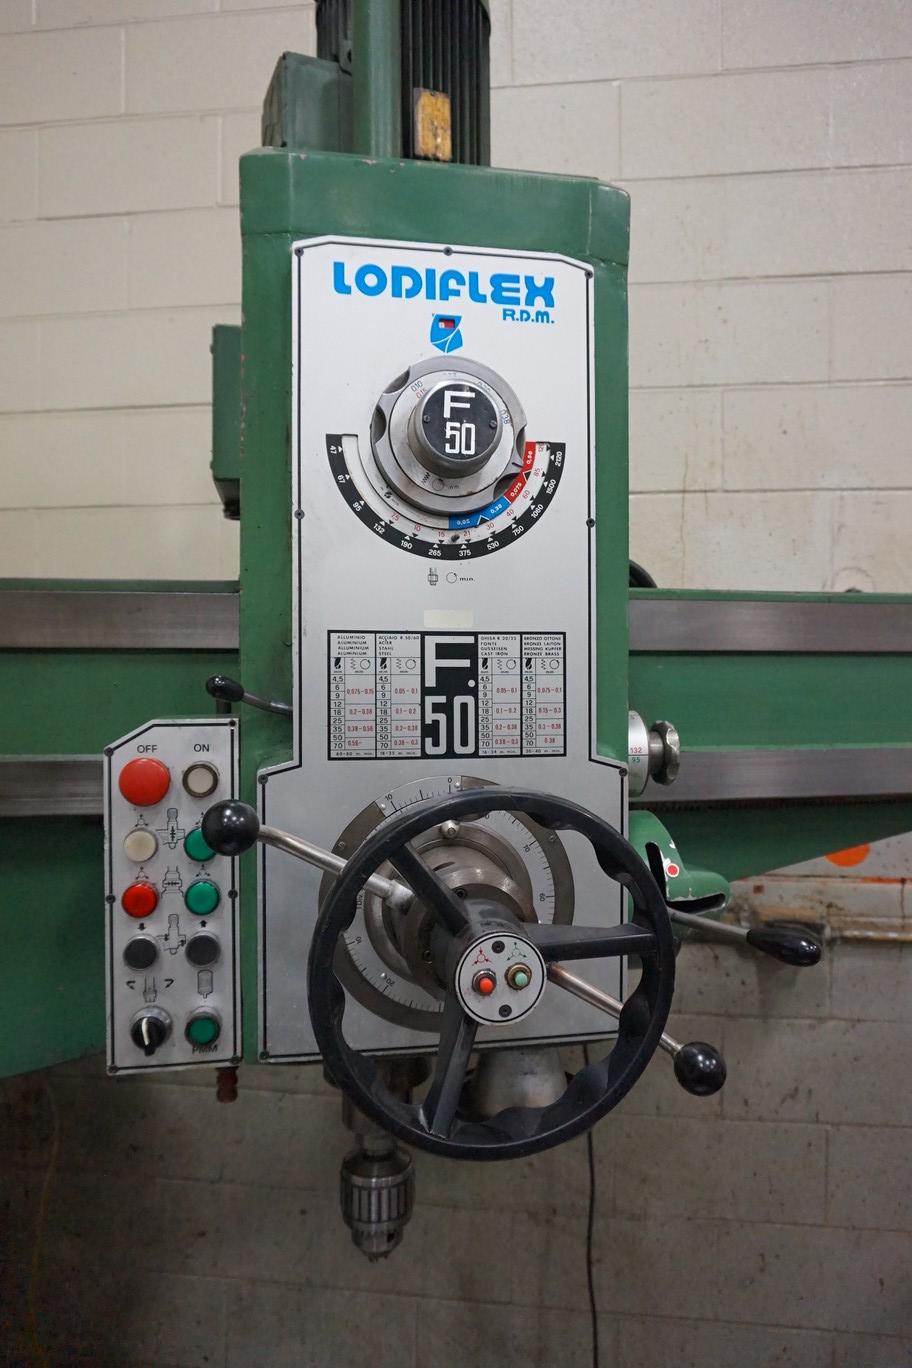 Lodiflex Model F50 Radial Arm Drill - Image 2 of 4